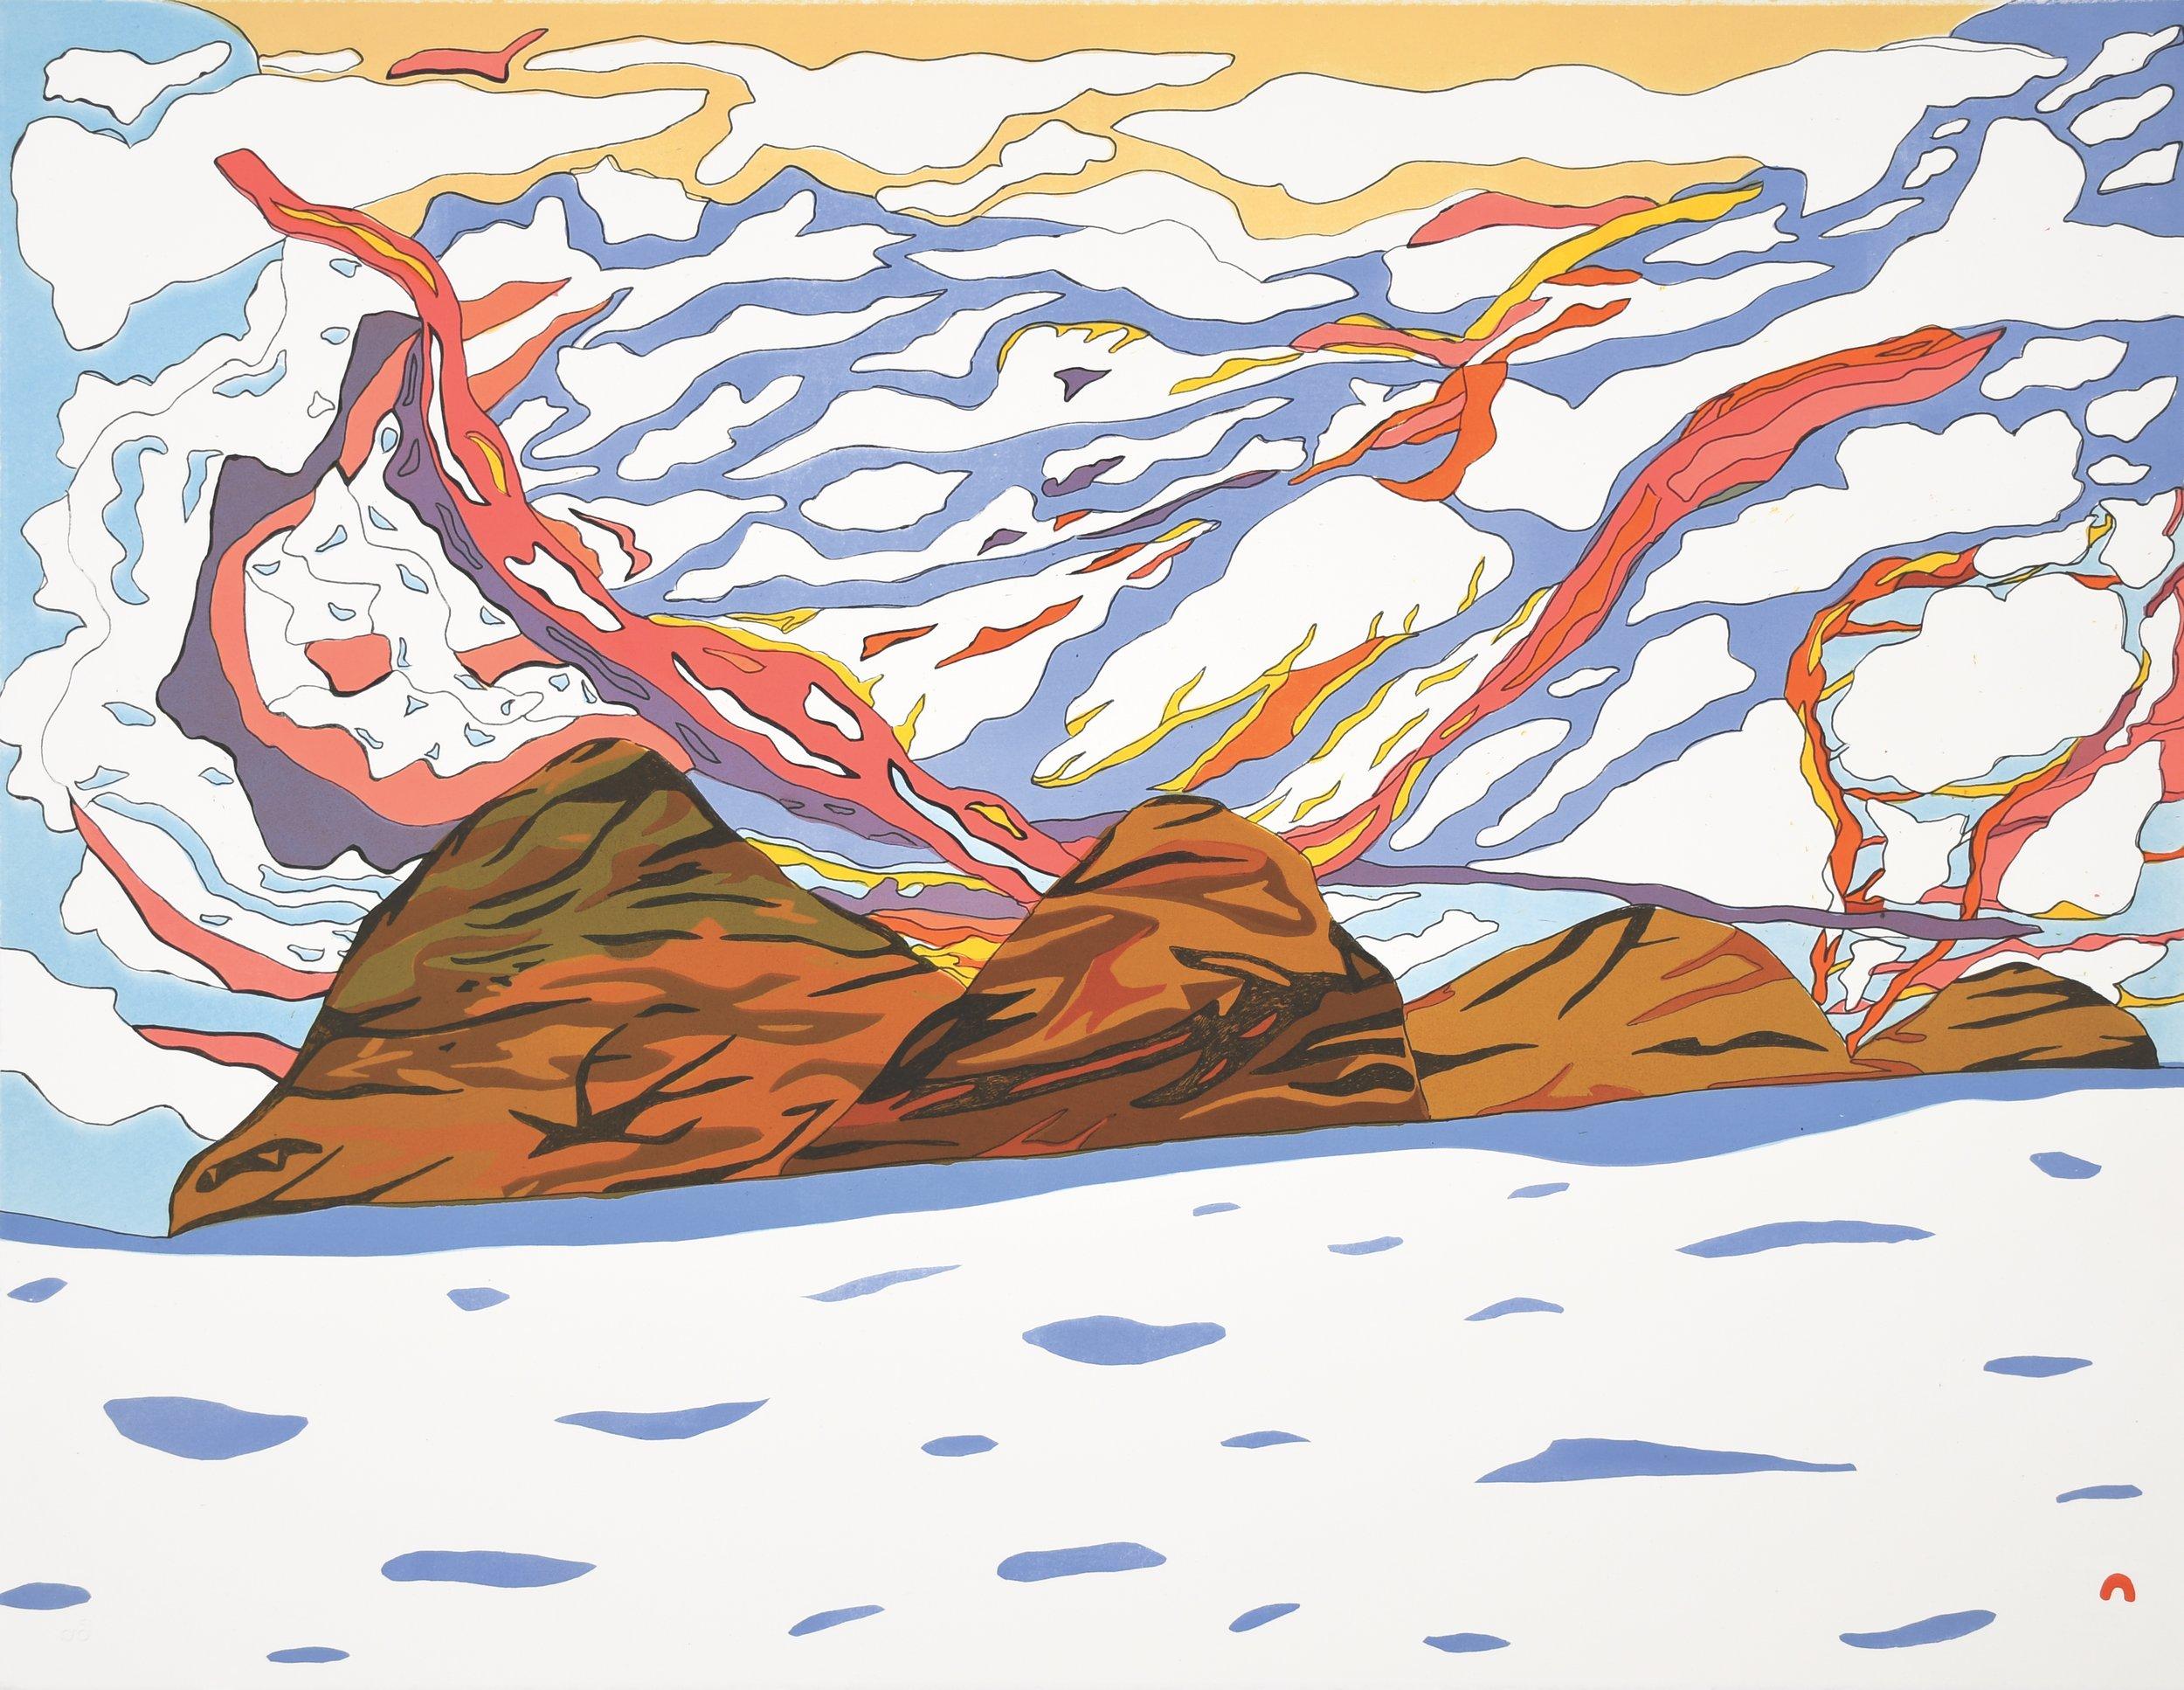 OOLOOSIE SAILA  16. Sunlit Sky  Lithograph  Paper: BFK Rives White  Printer: Niveaksie Quvianaqtuliaq  56.5 x 73 cm  $ 750